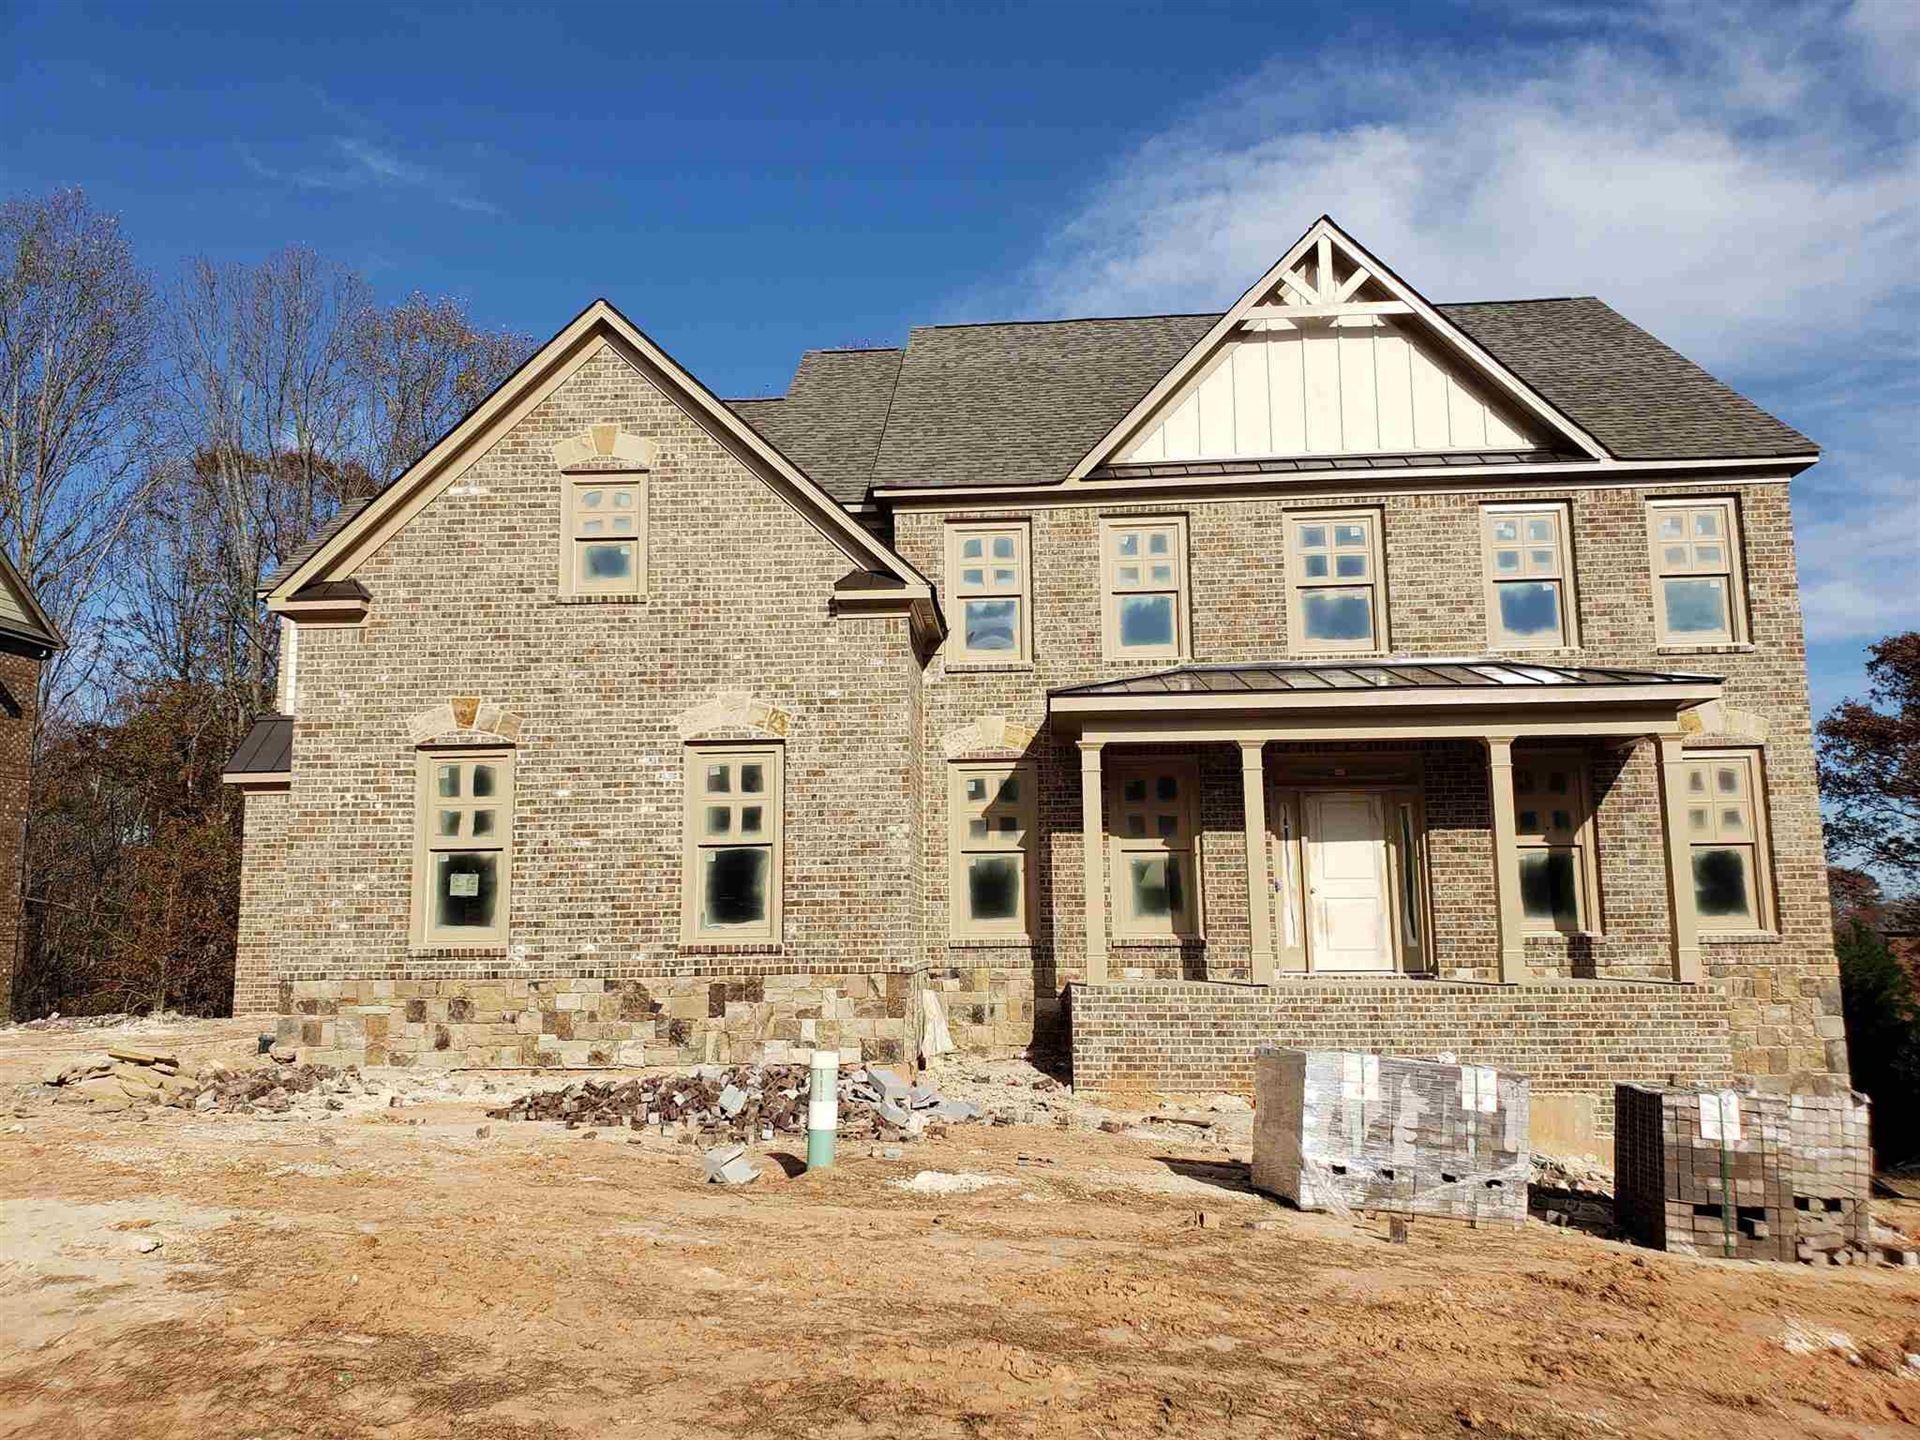 1129 Woodtrace Ln, Auburn, GA 30011 - #: 8860829